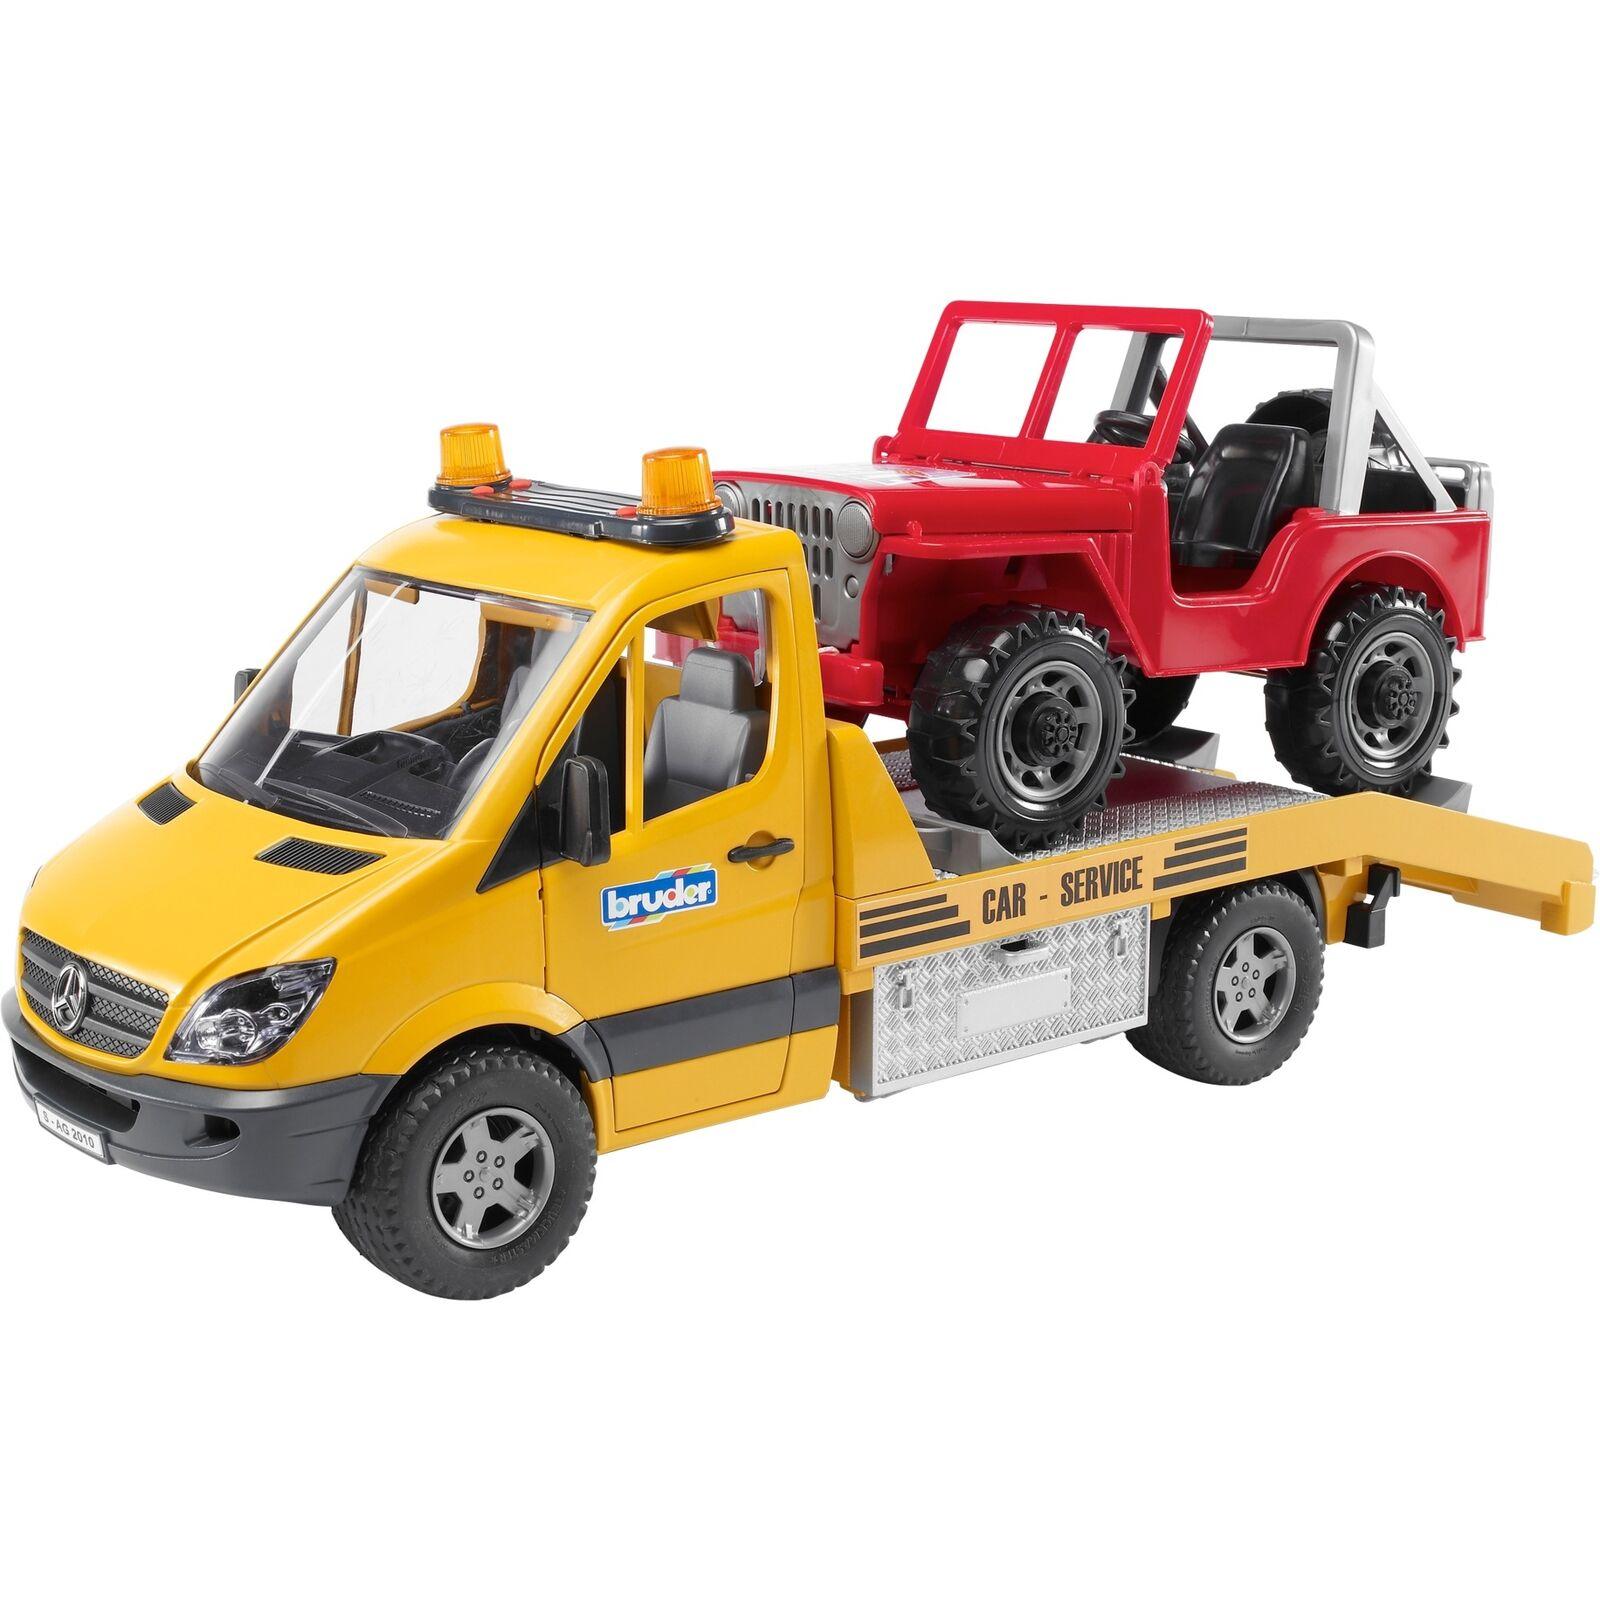 Bruder MB Sprinter Autotransporter Modellfahrzeug